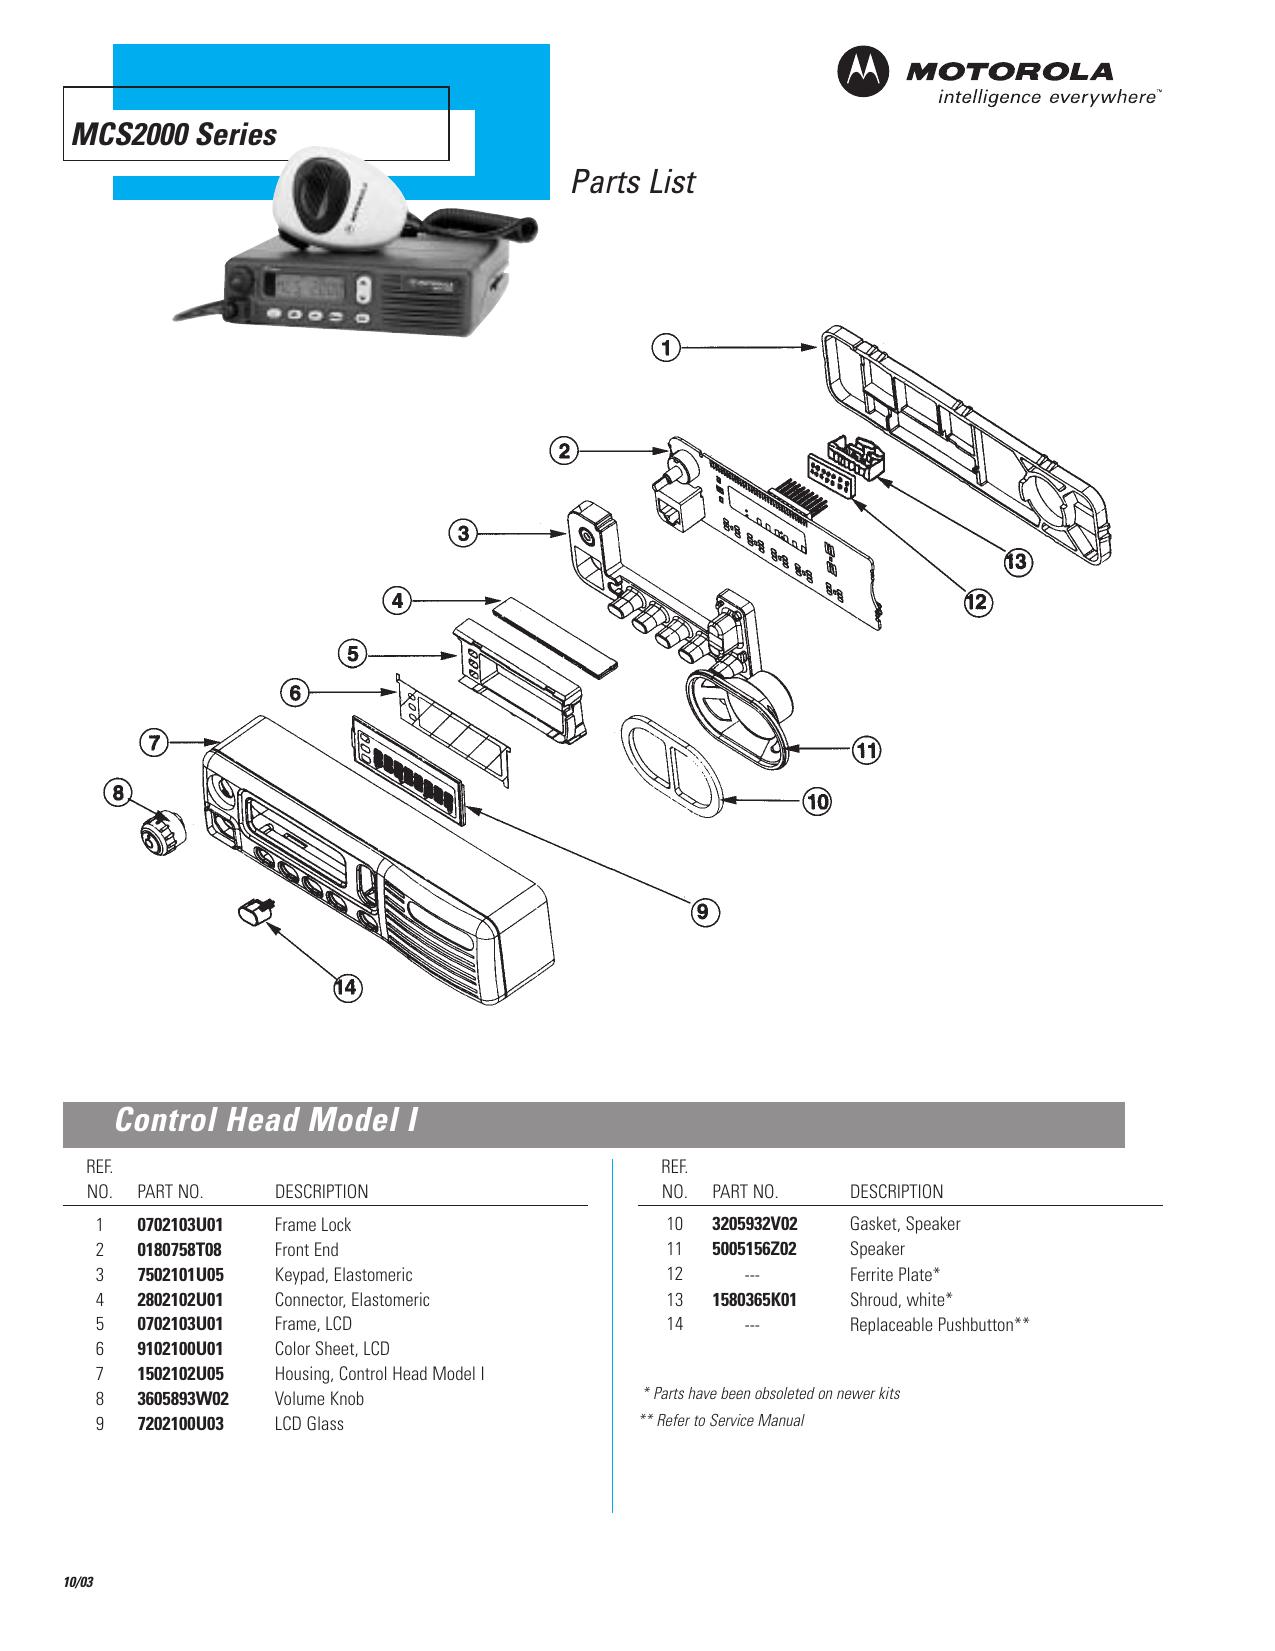 Microphone Wiring Diagram Free Download Wiring Diagram Schematic